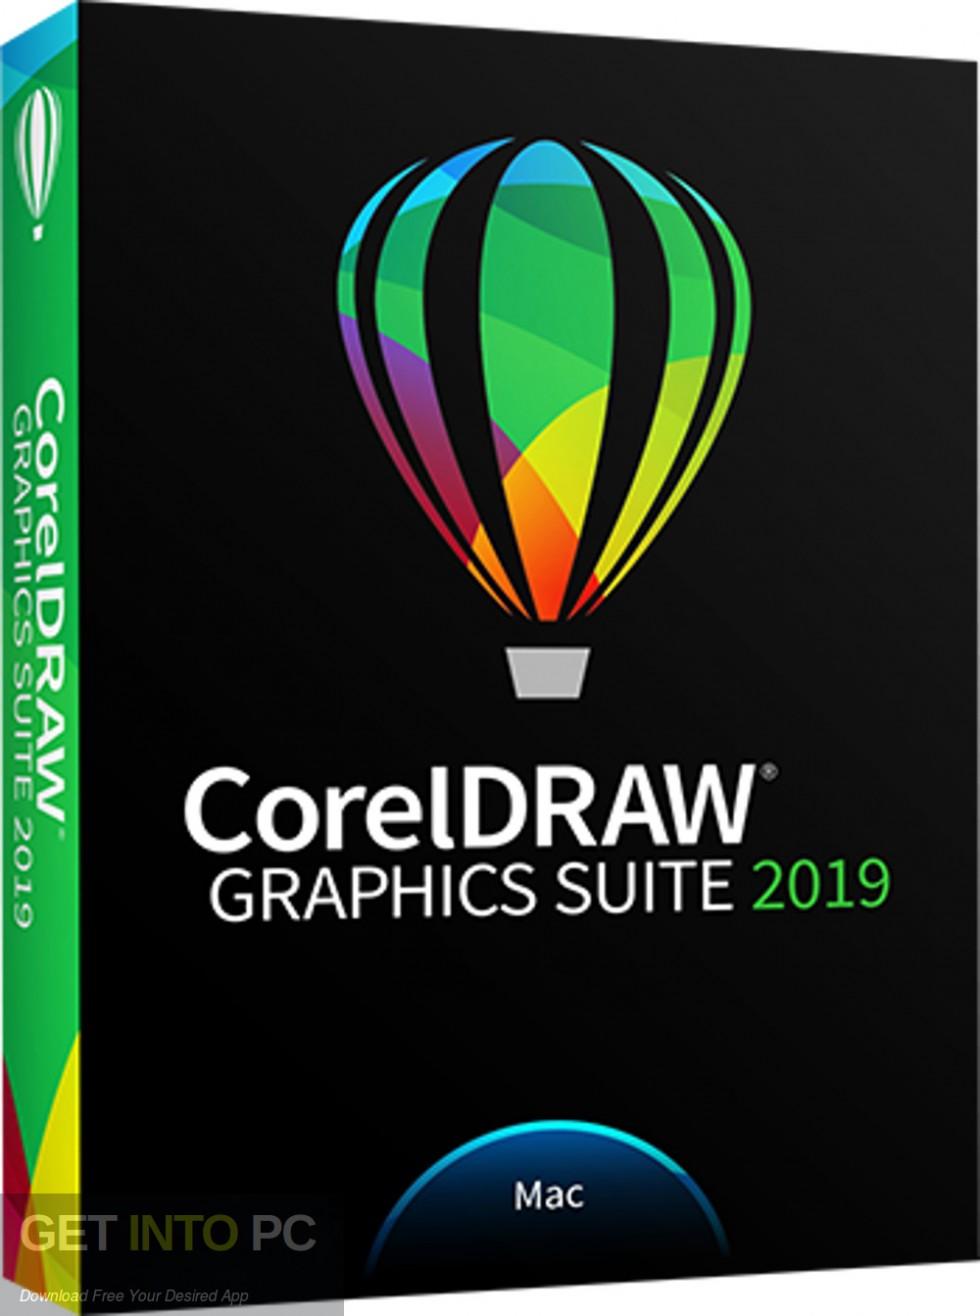 CorelDRAW Graphics Suite 2019 Free Download-GetintoPC.com